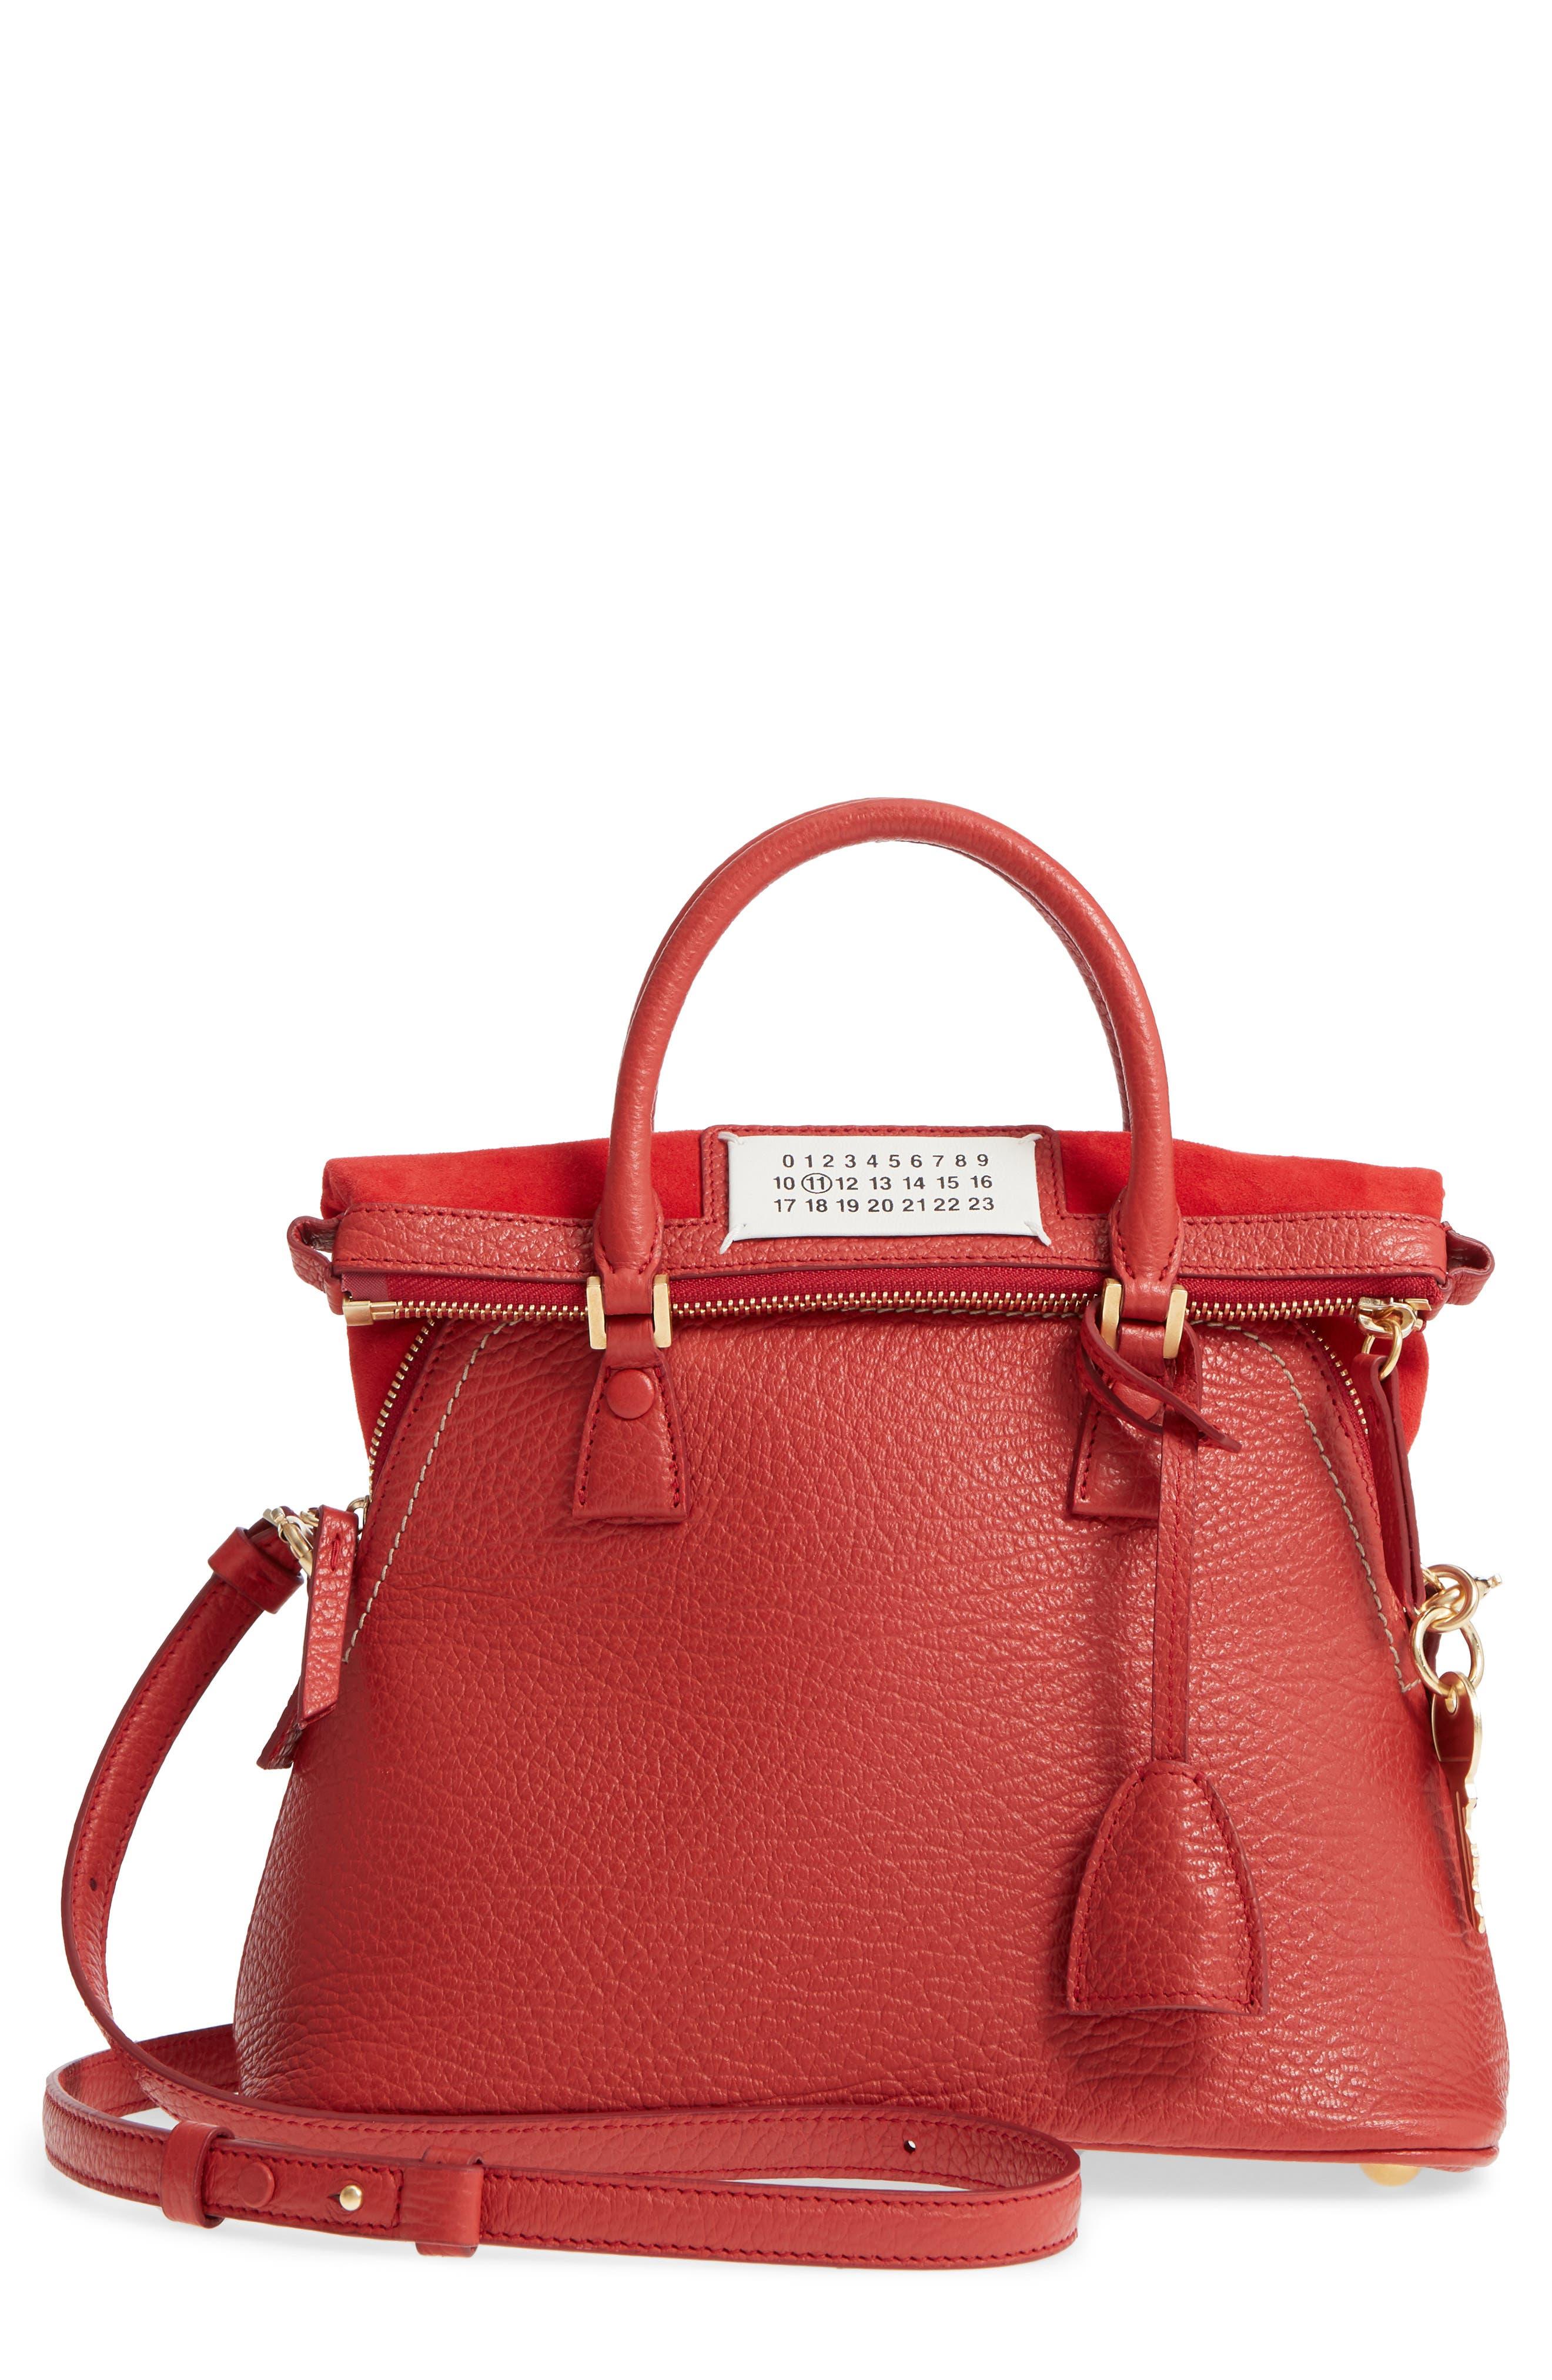 Main Image - Maison Margiela Small 5AC Calfskin Leather Handbag